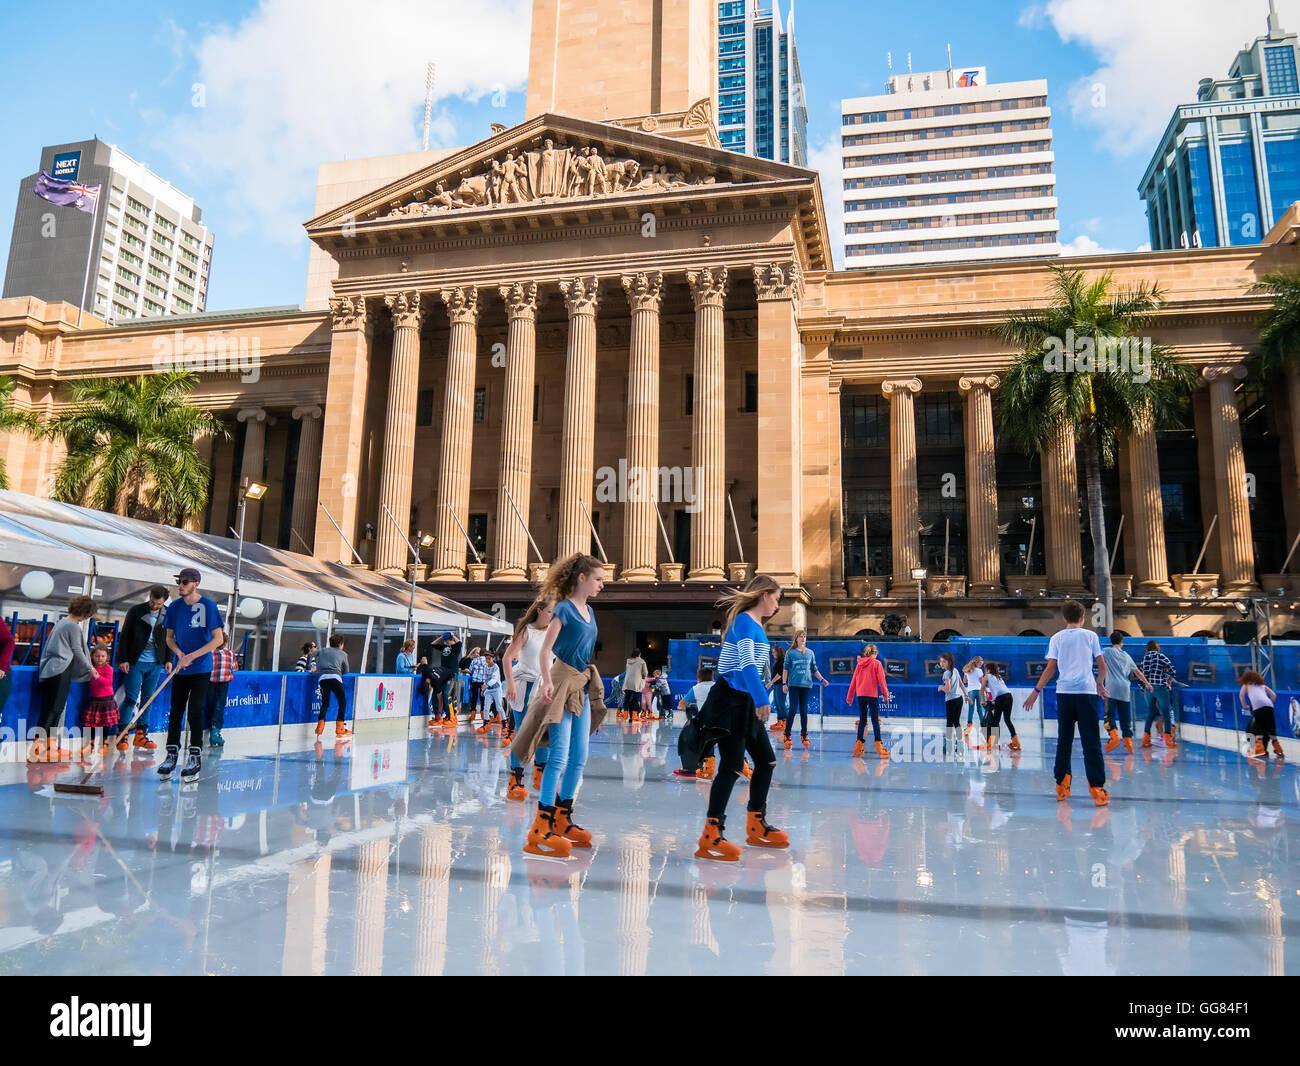 BRISBANE, AUS - JUN 24 2016: Winter Festival in Brisbane, outdoor ice-skating, King George Square - Stock Image